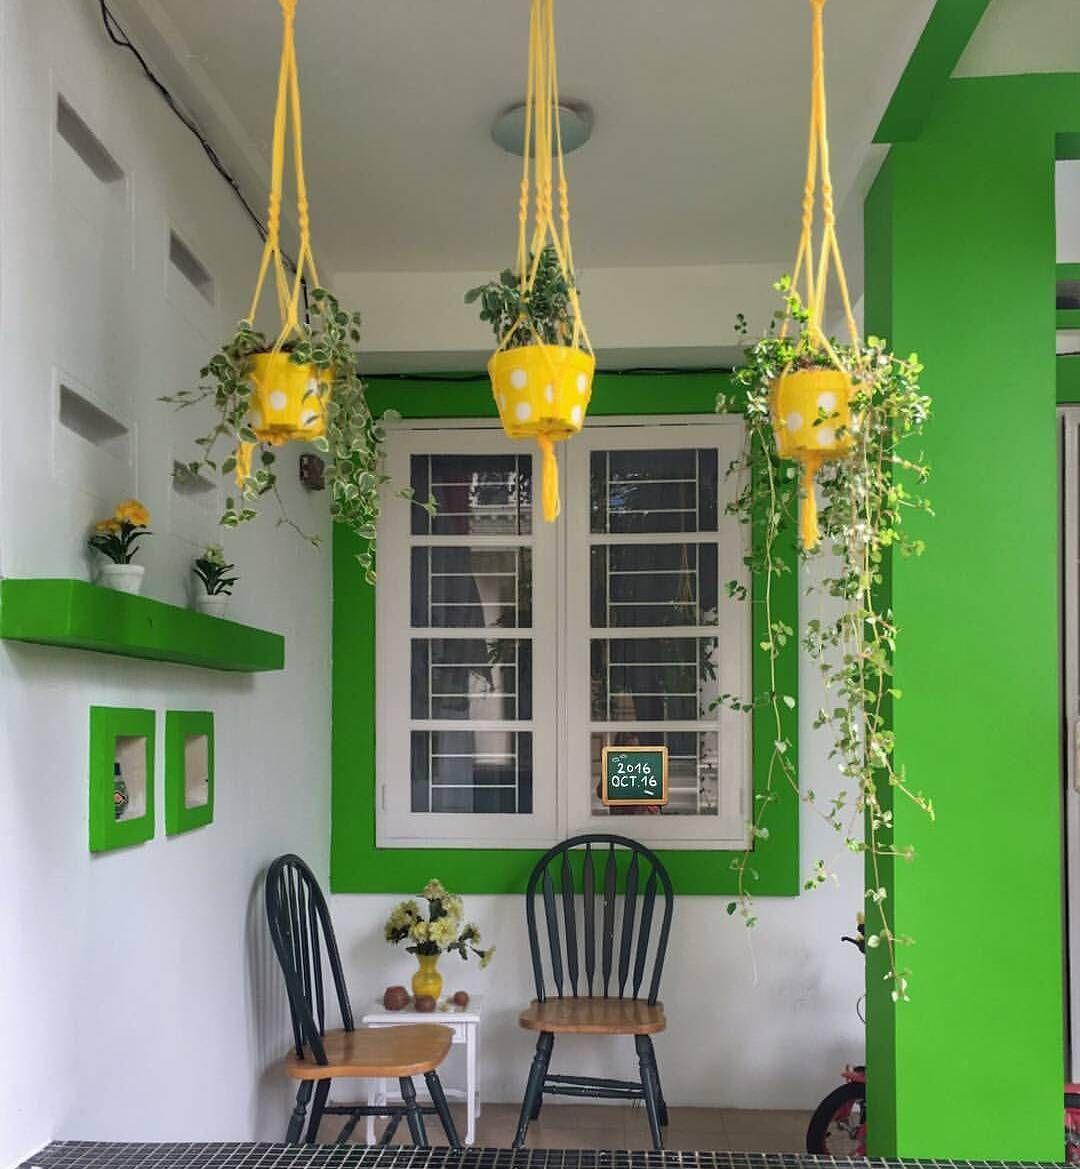 Interior Rumah Minimalis Warna Hijau - Rumah Joglo Limasan Work